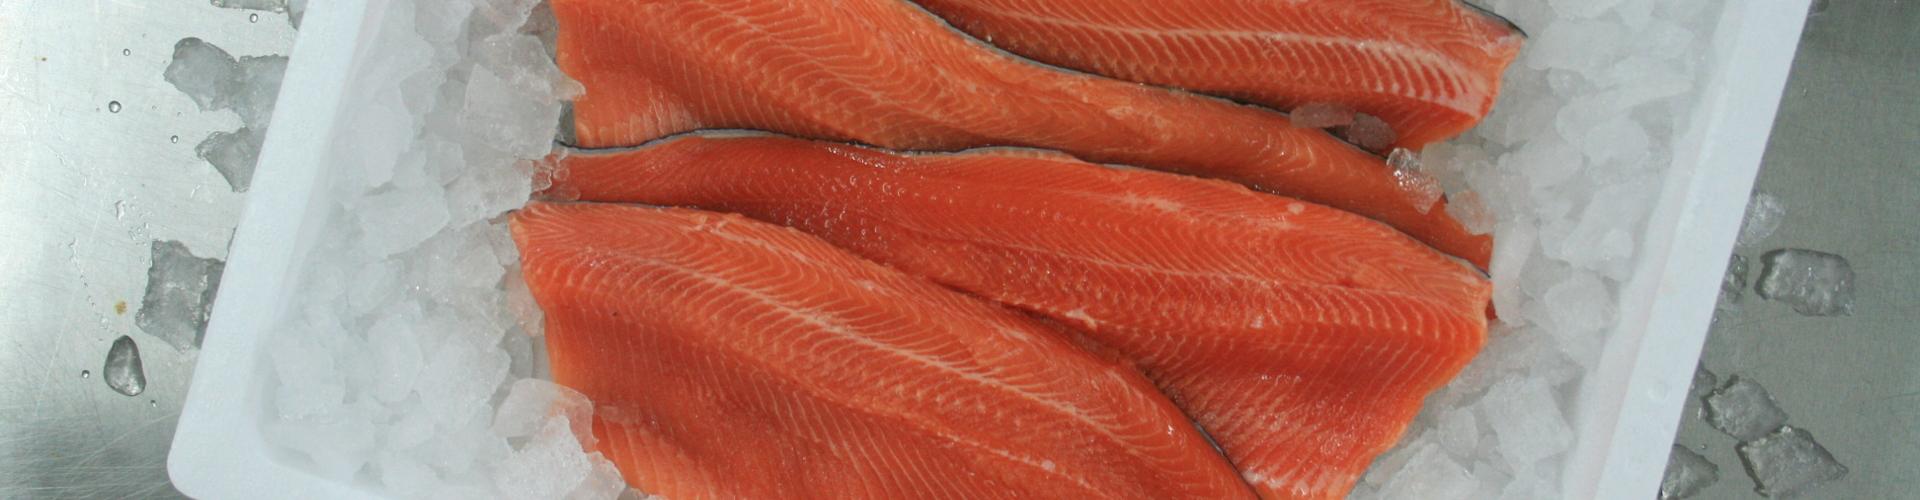 Lachs, © decleva's alpenfisch